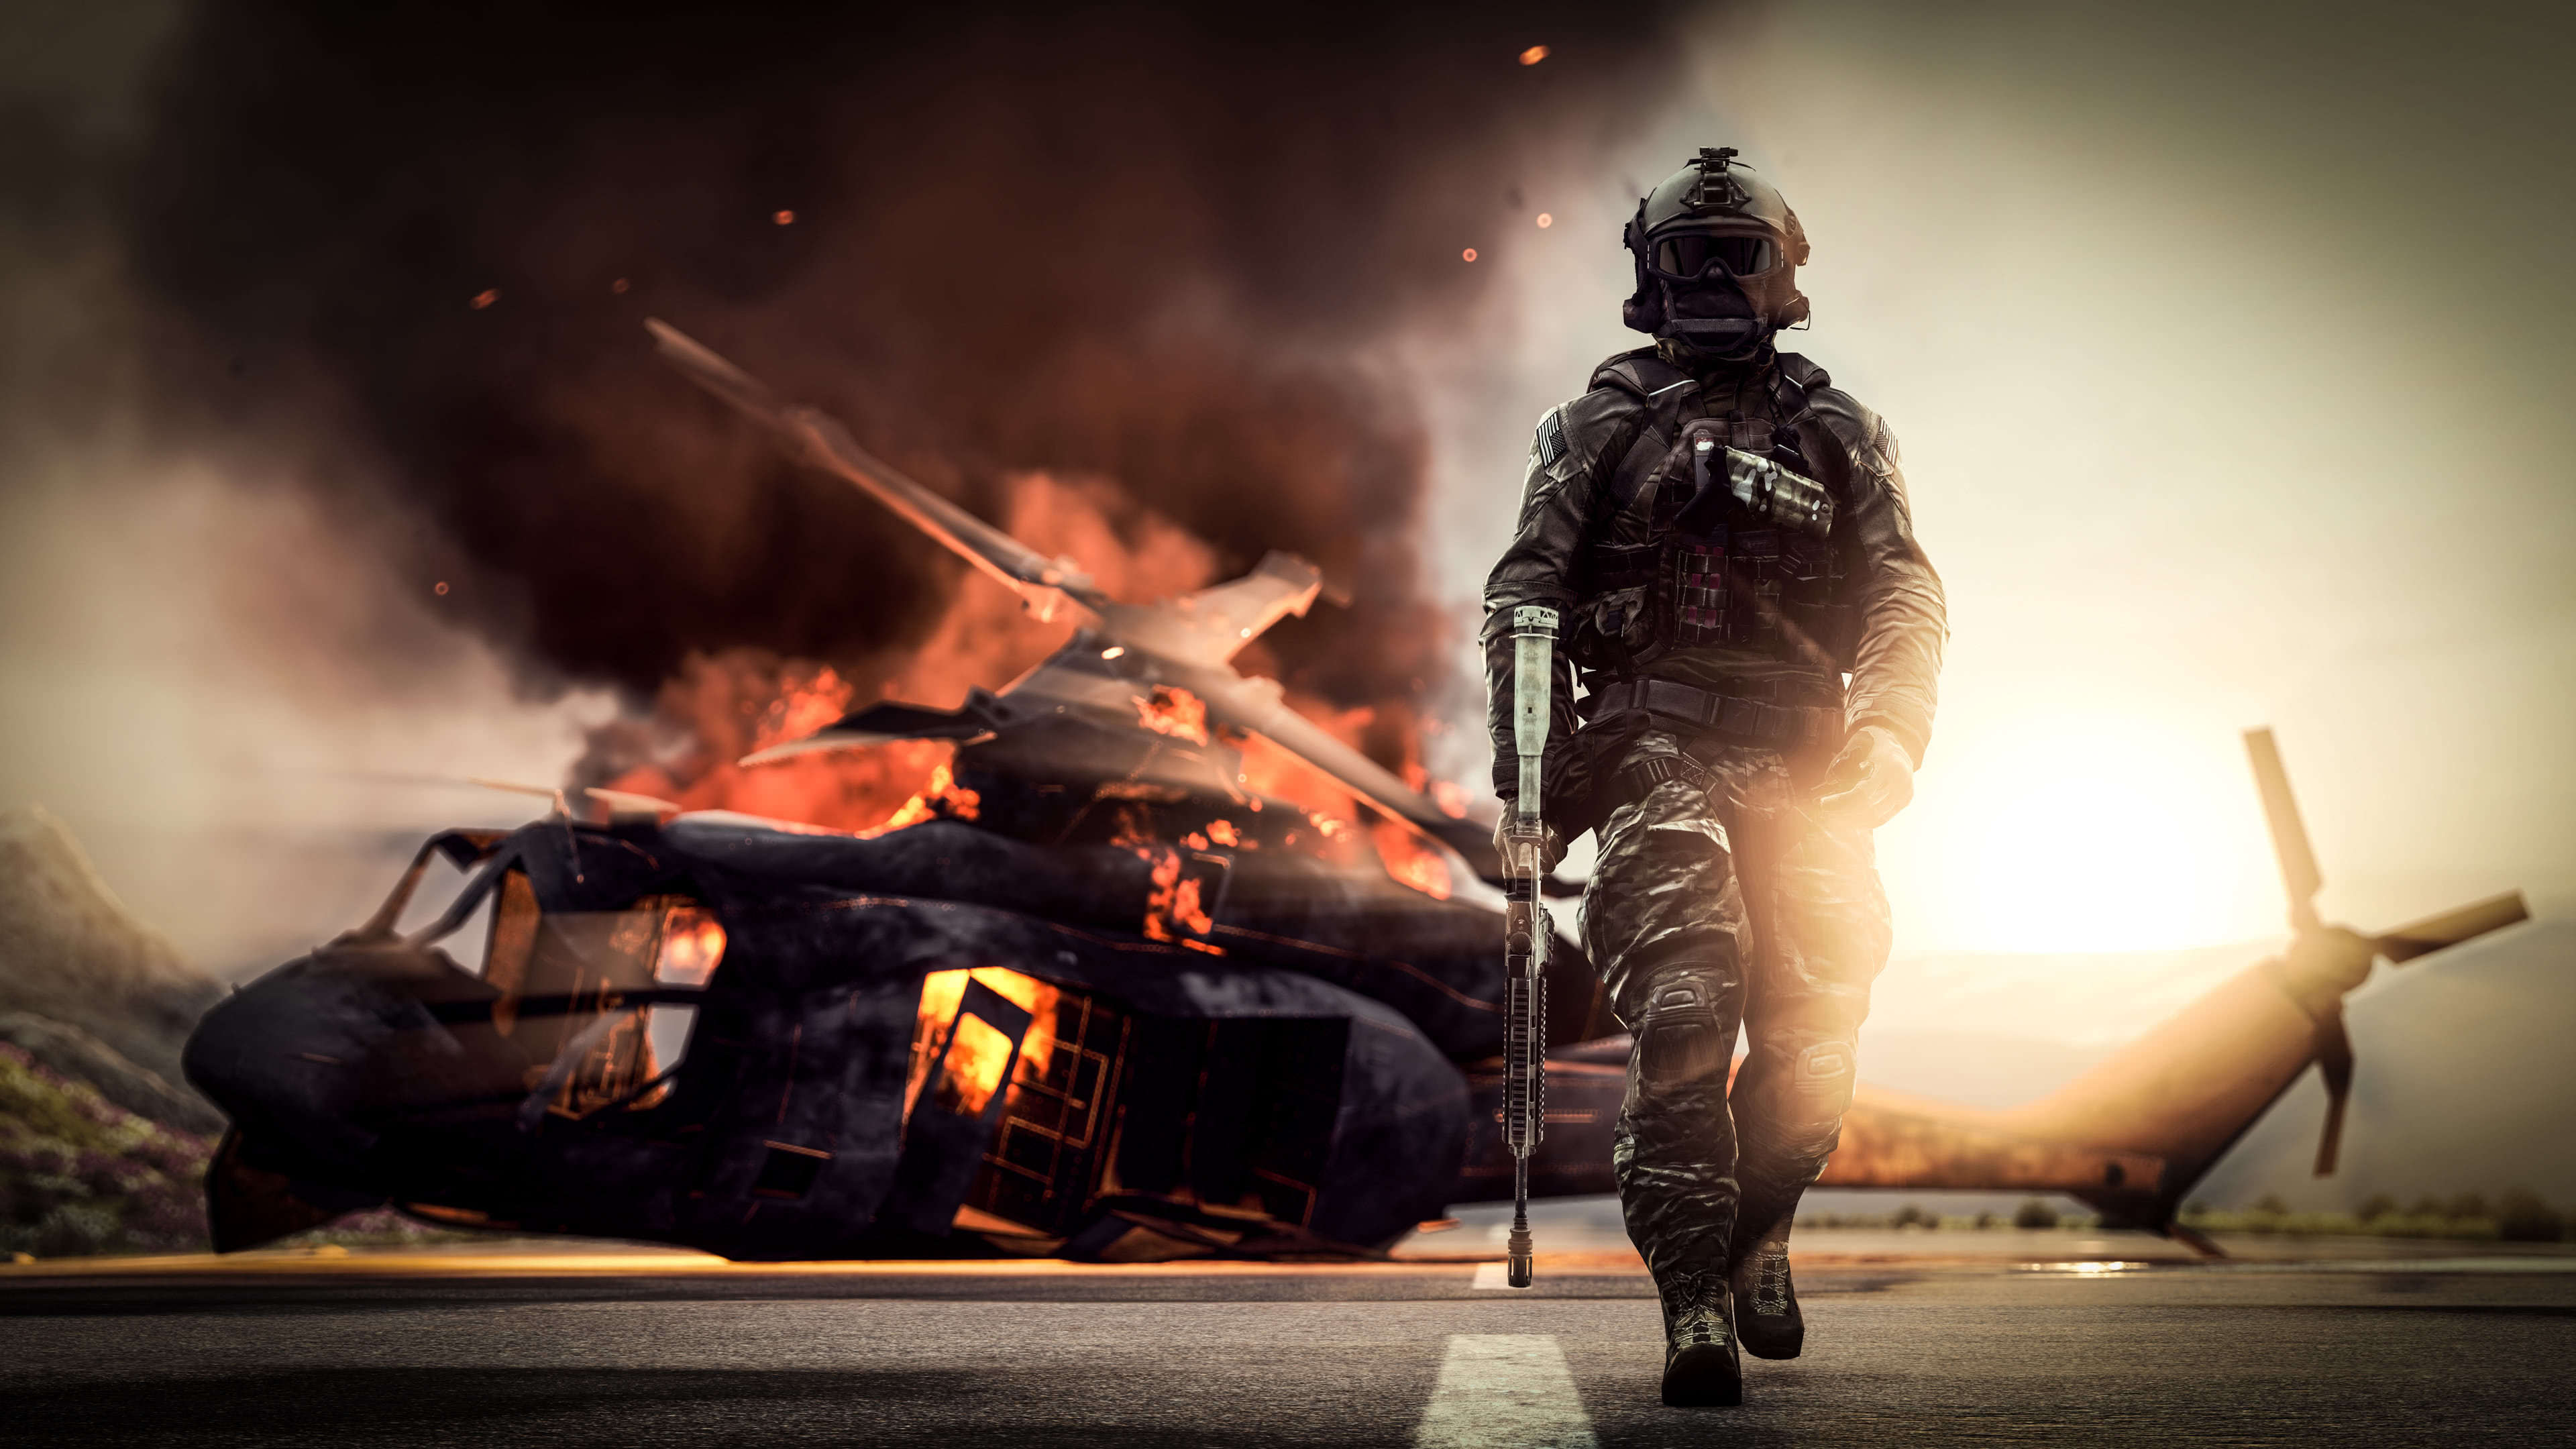 Battlefield 4 Soldier Helicopter UHD 4K Wallpaper